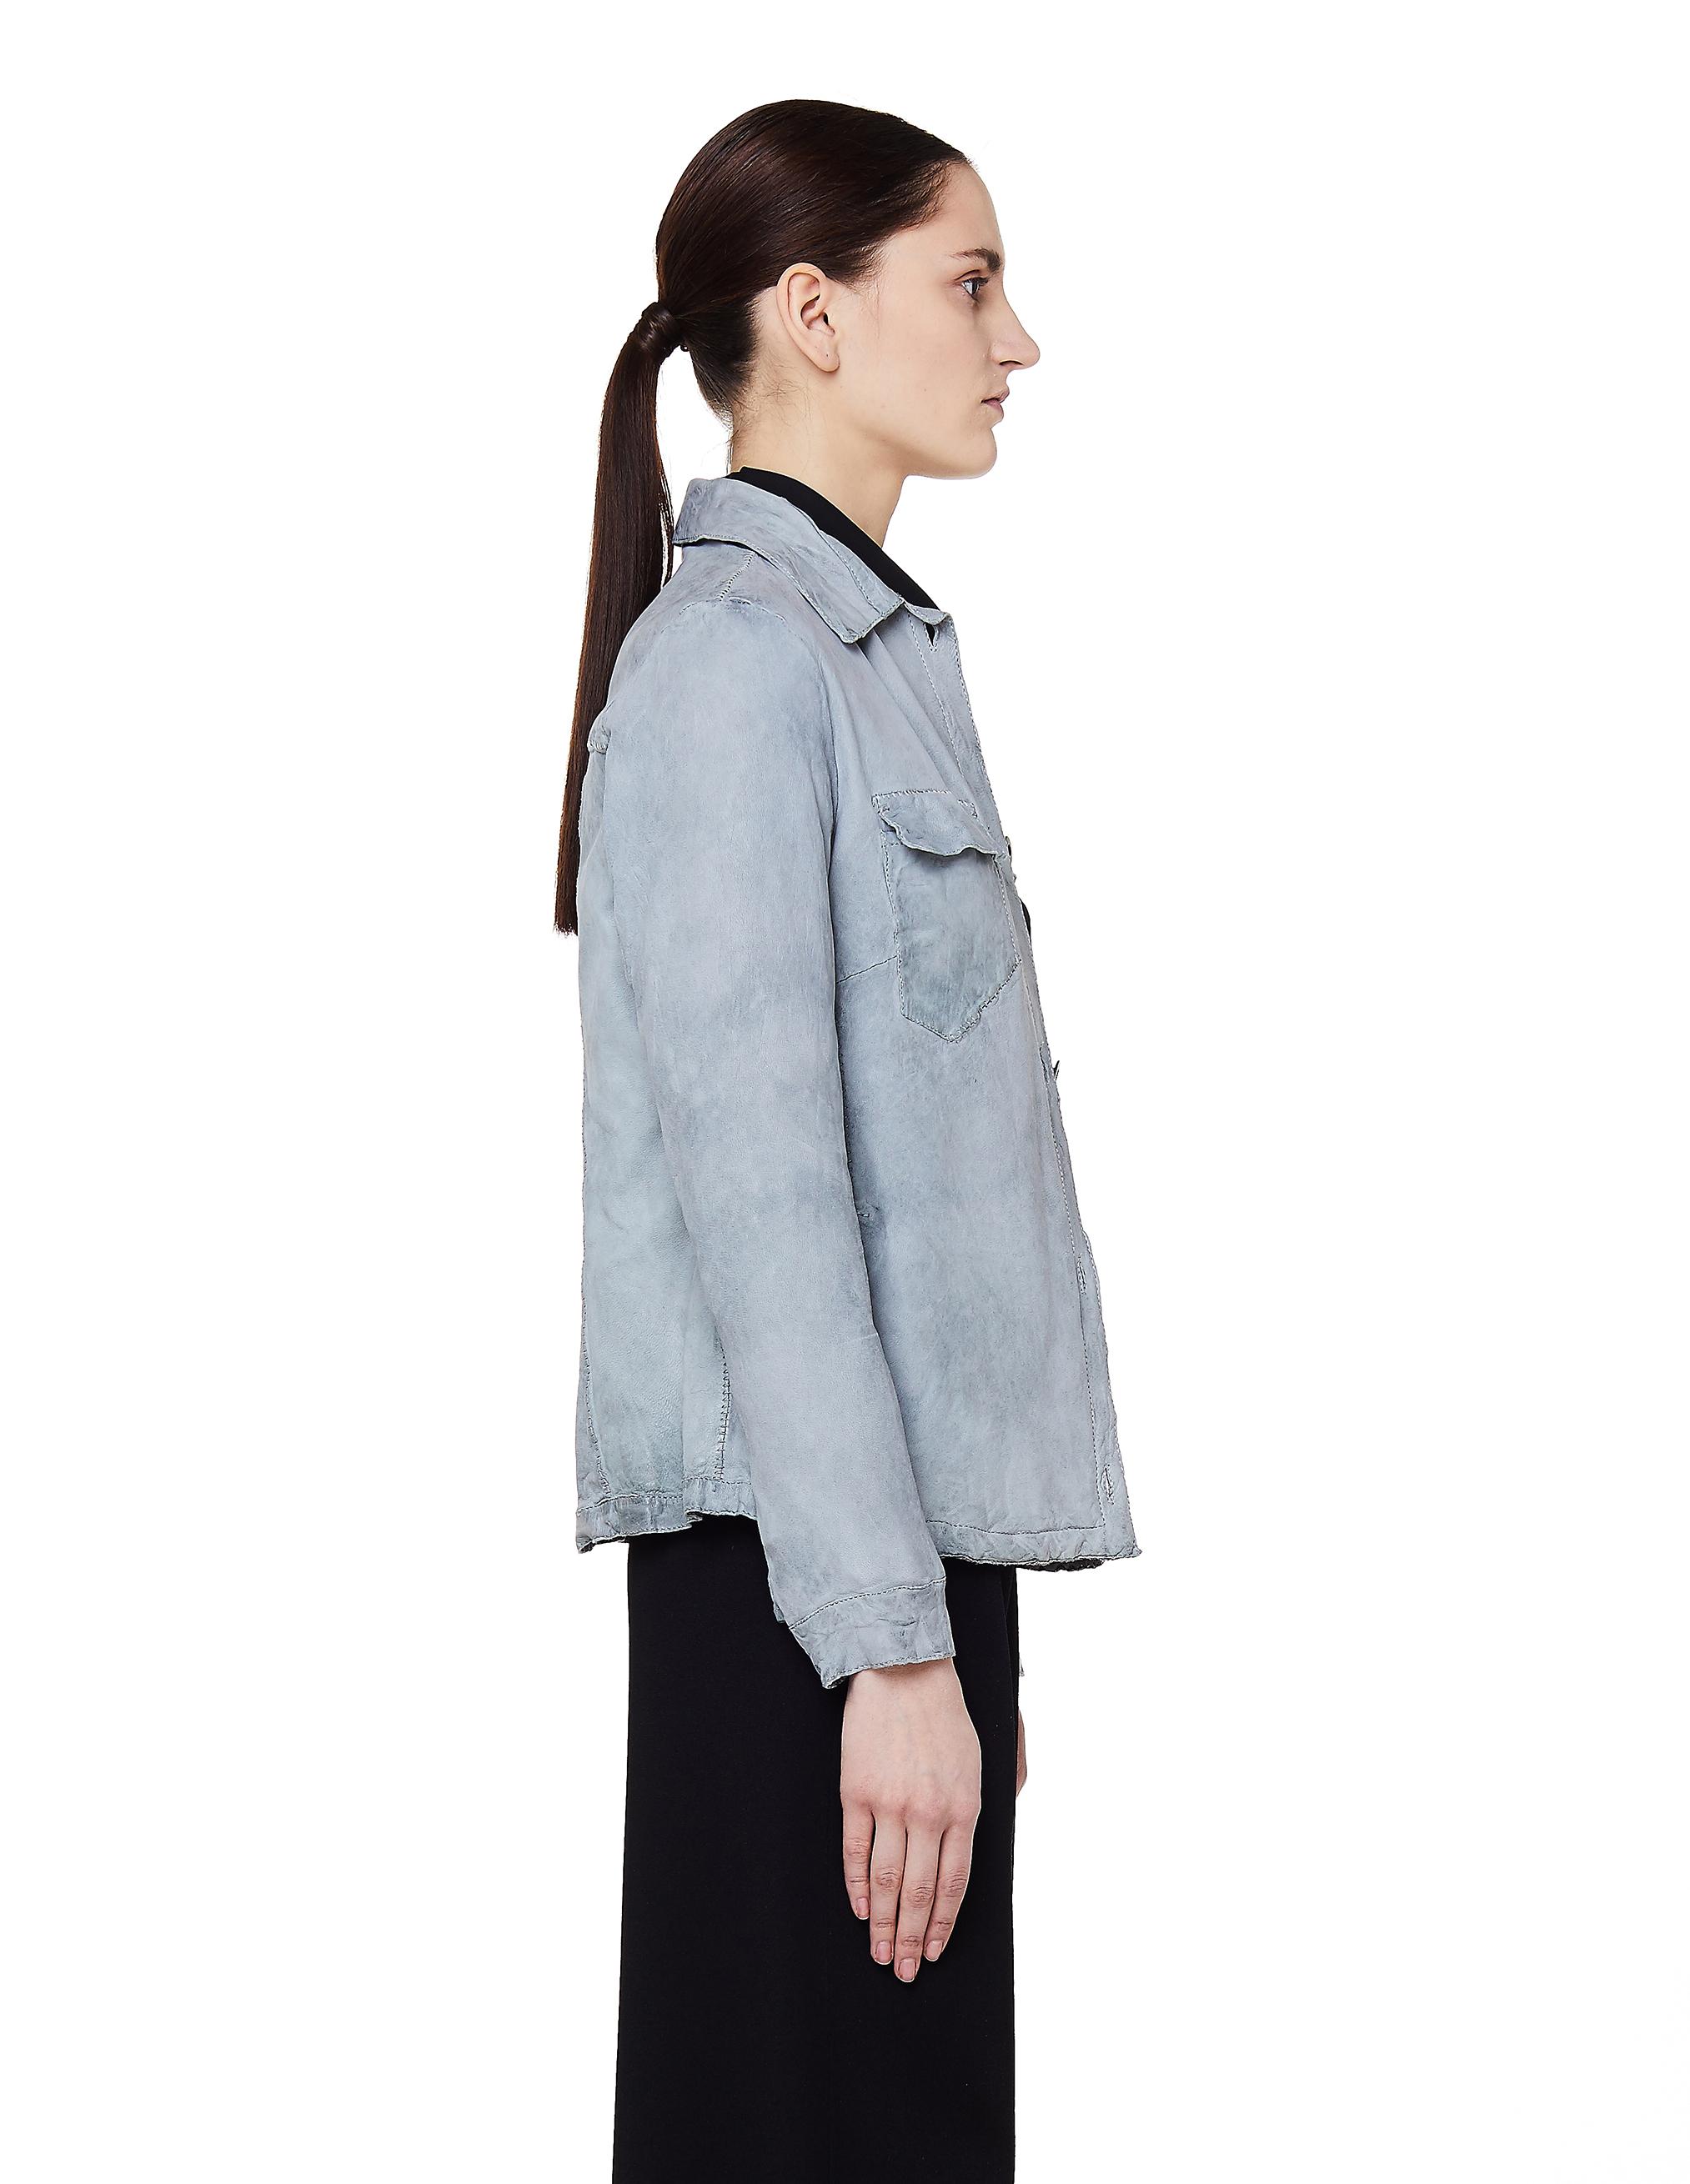 Salvatore Santoro Light Blue Leather Jacket